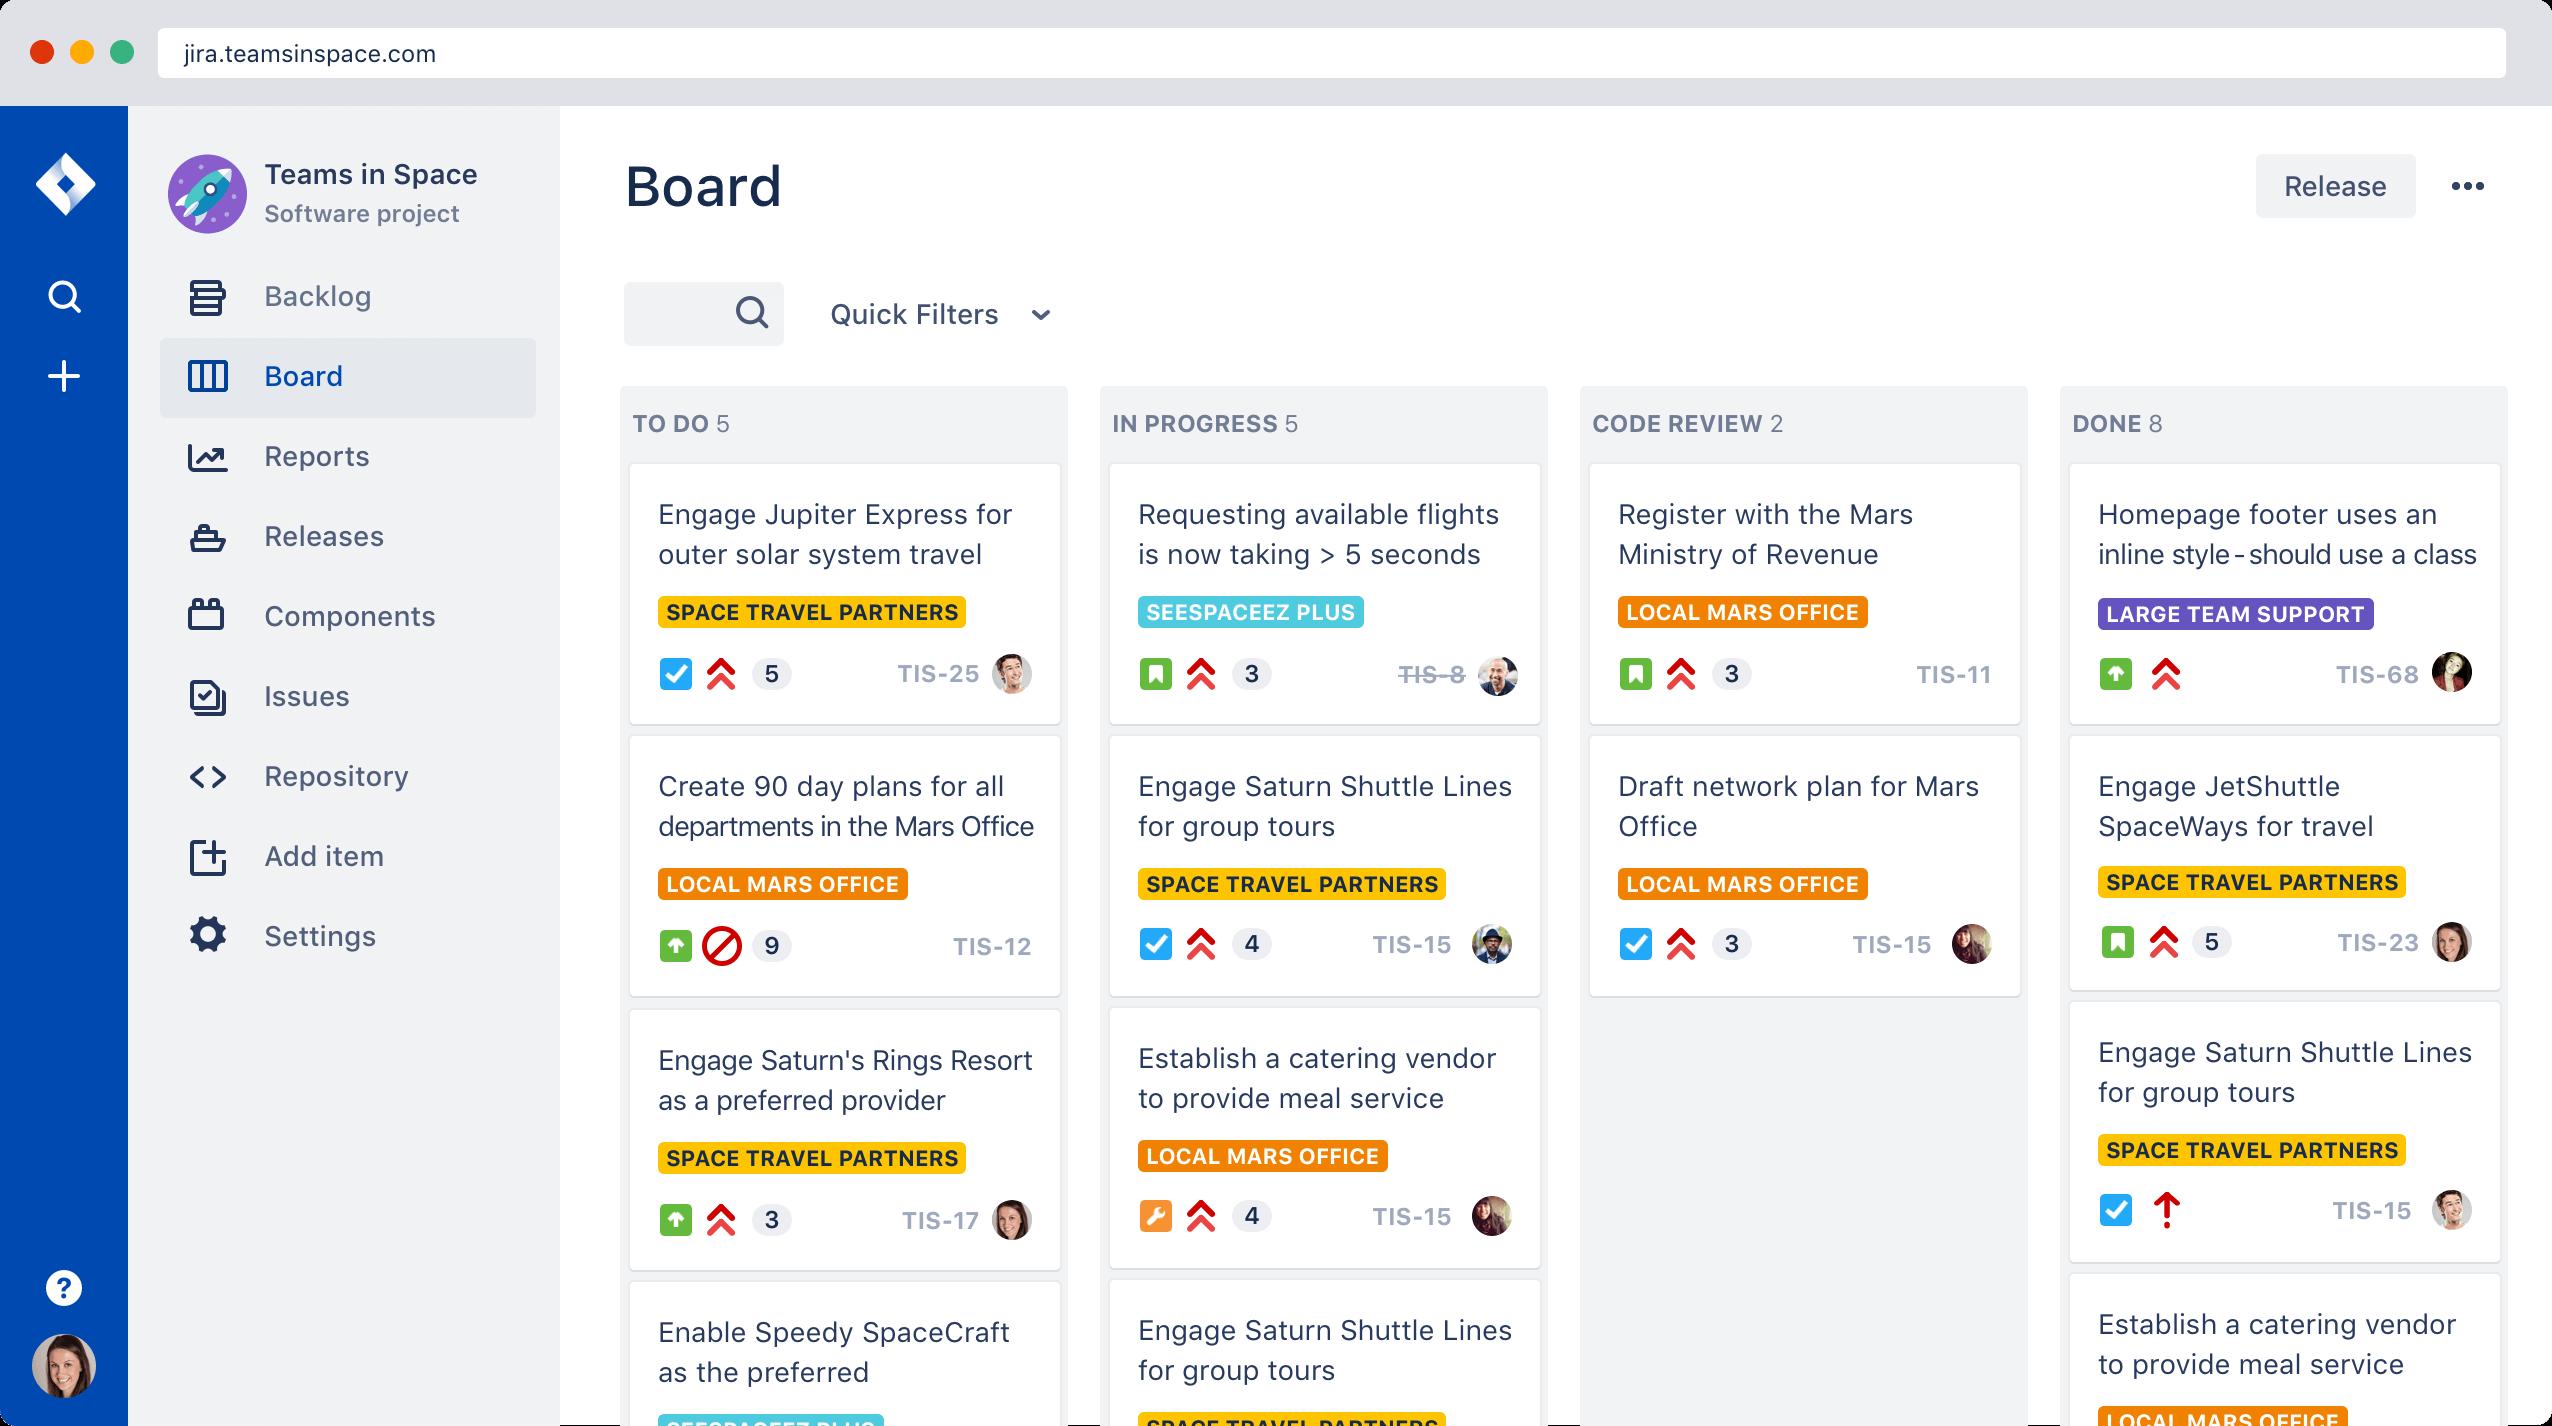 https://www.atlassian.com/software/jira/features